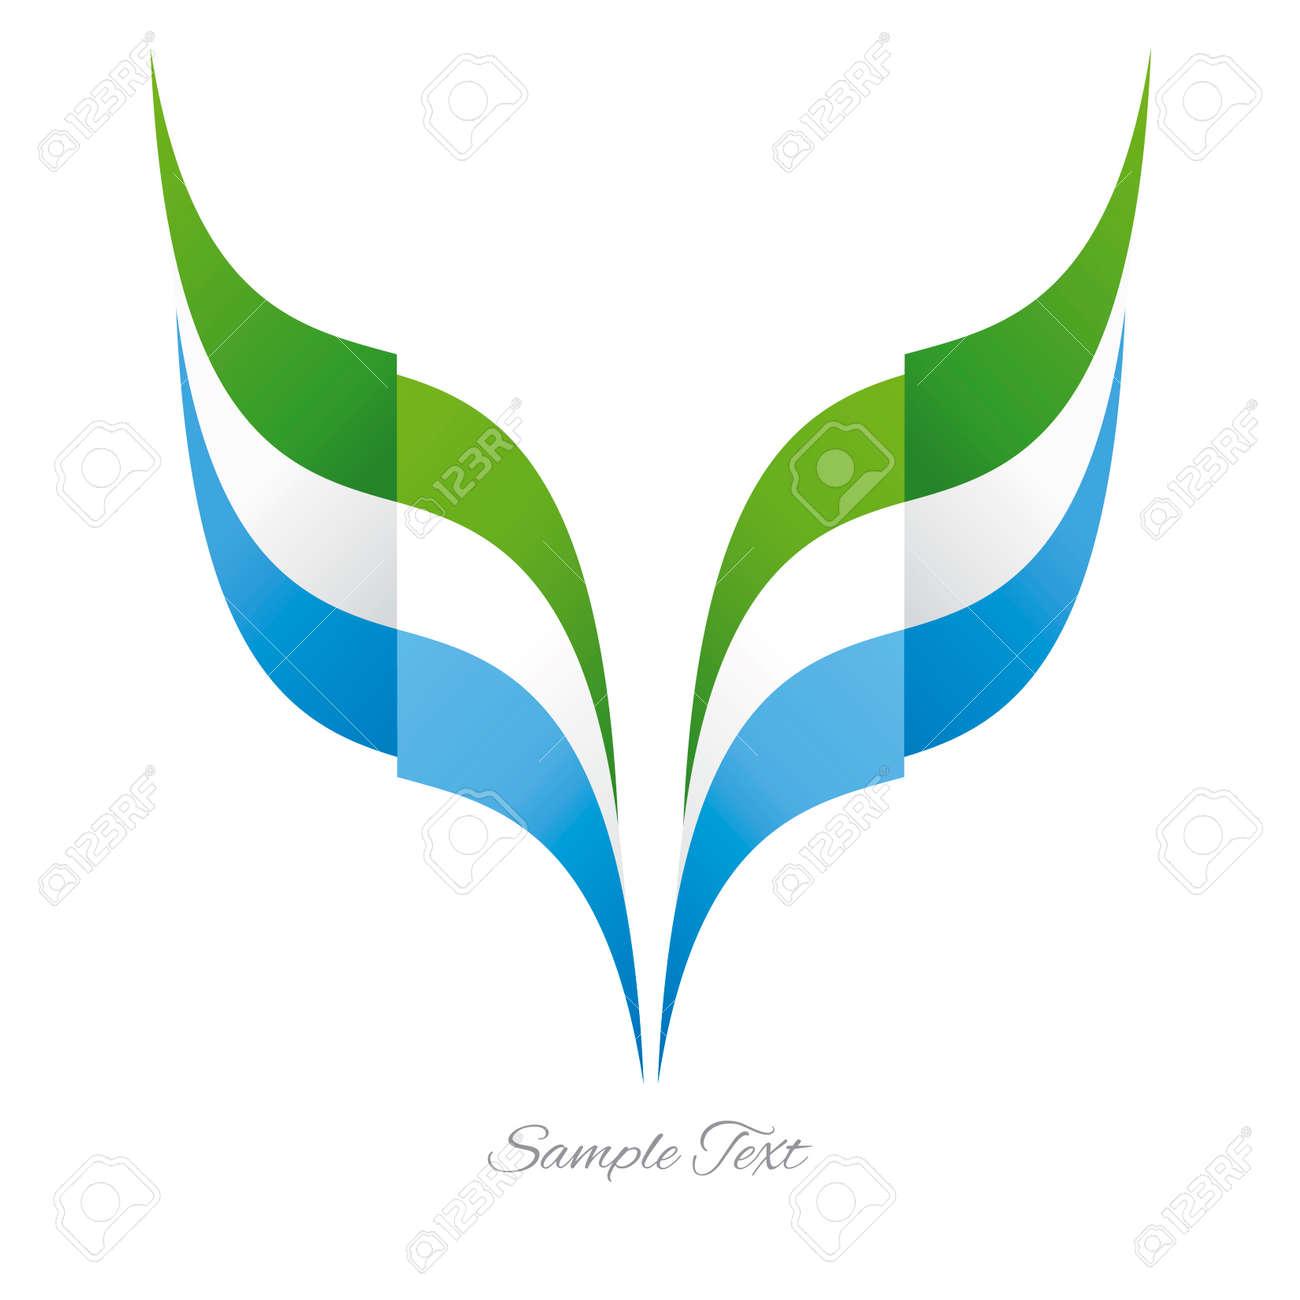 Abstract Sierra Leone eagle flag ribbon logo white background - 55160121